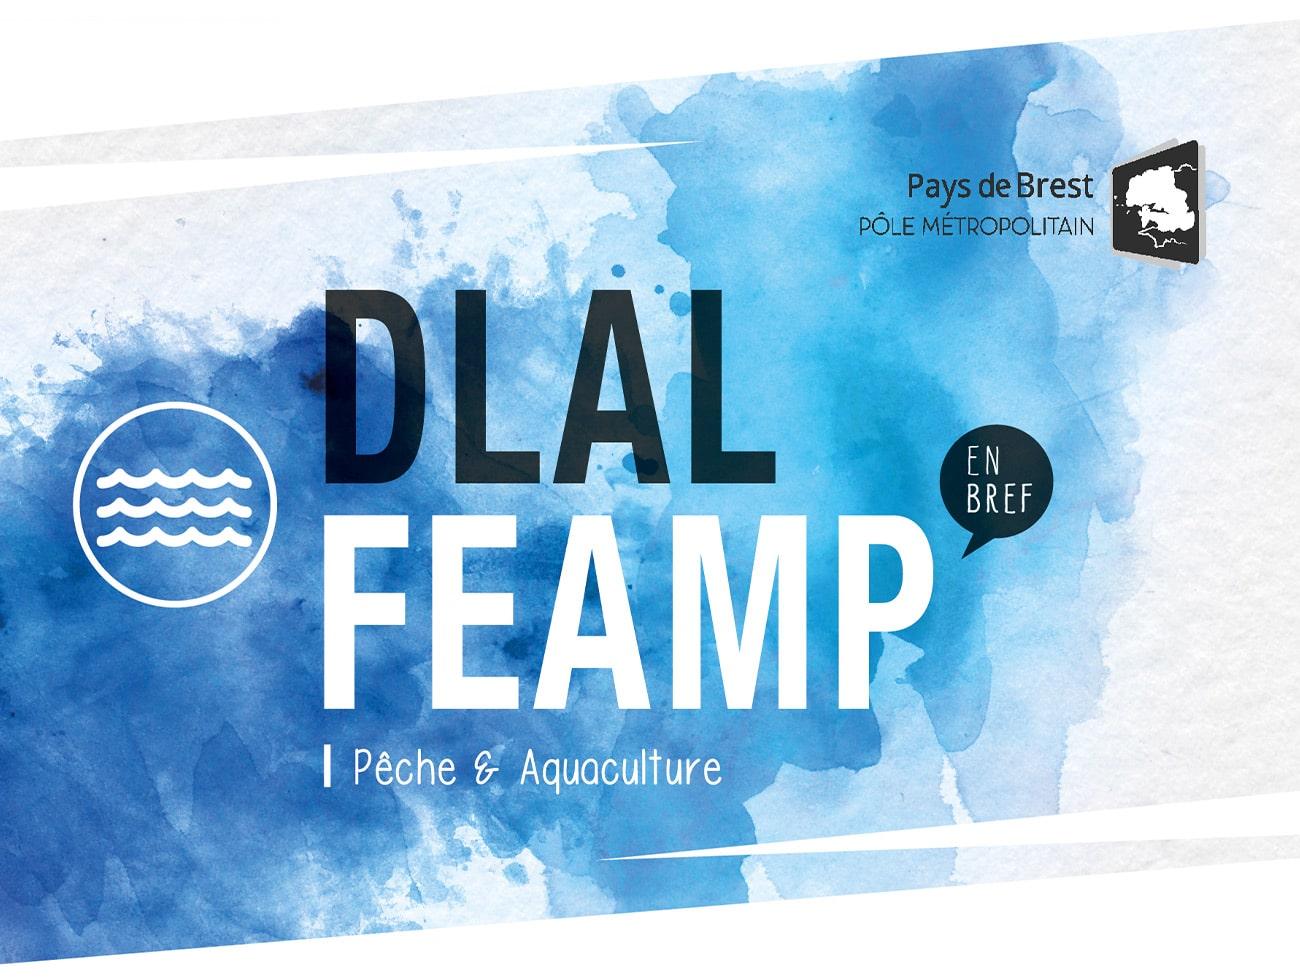 4-pole-metropolitain-campagne-fonds-communication-bretagne-lorient-DLAL-FEAMP